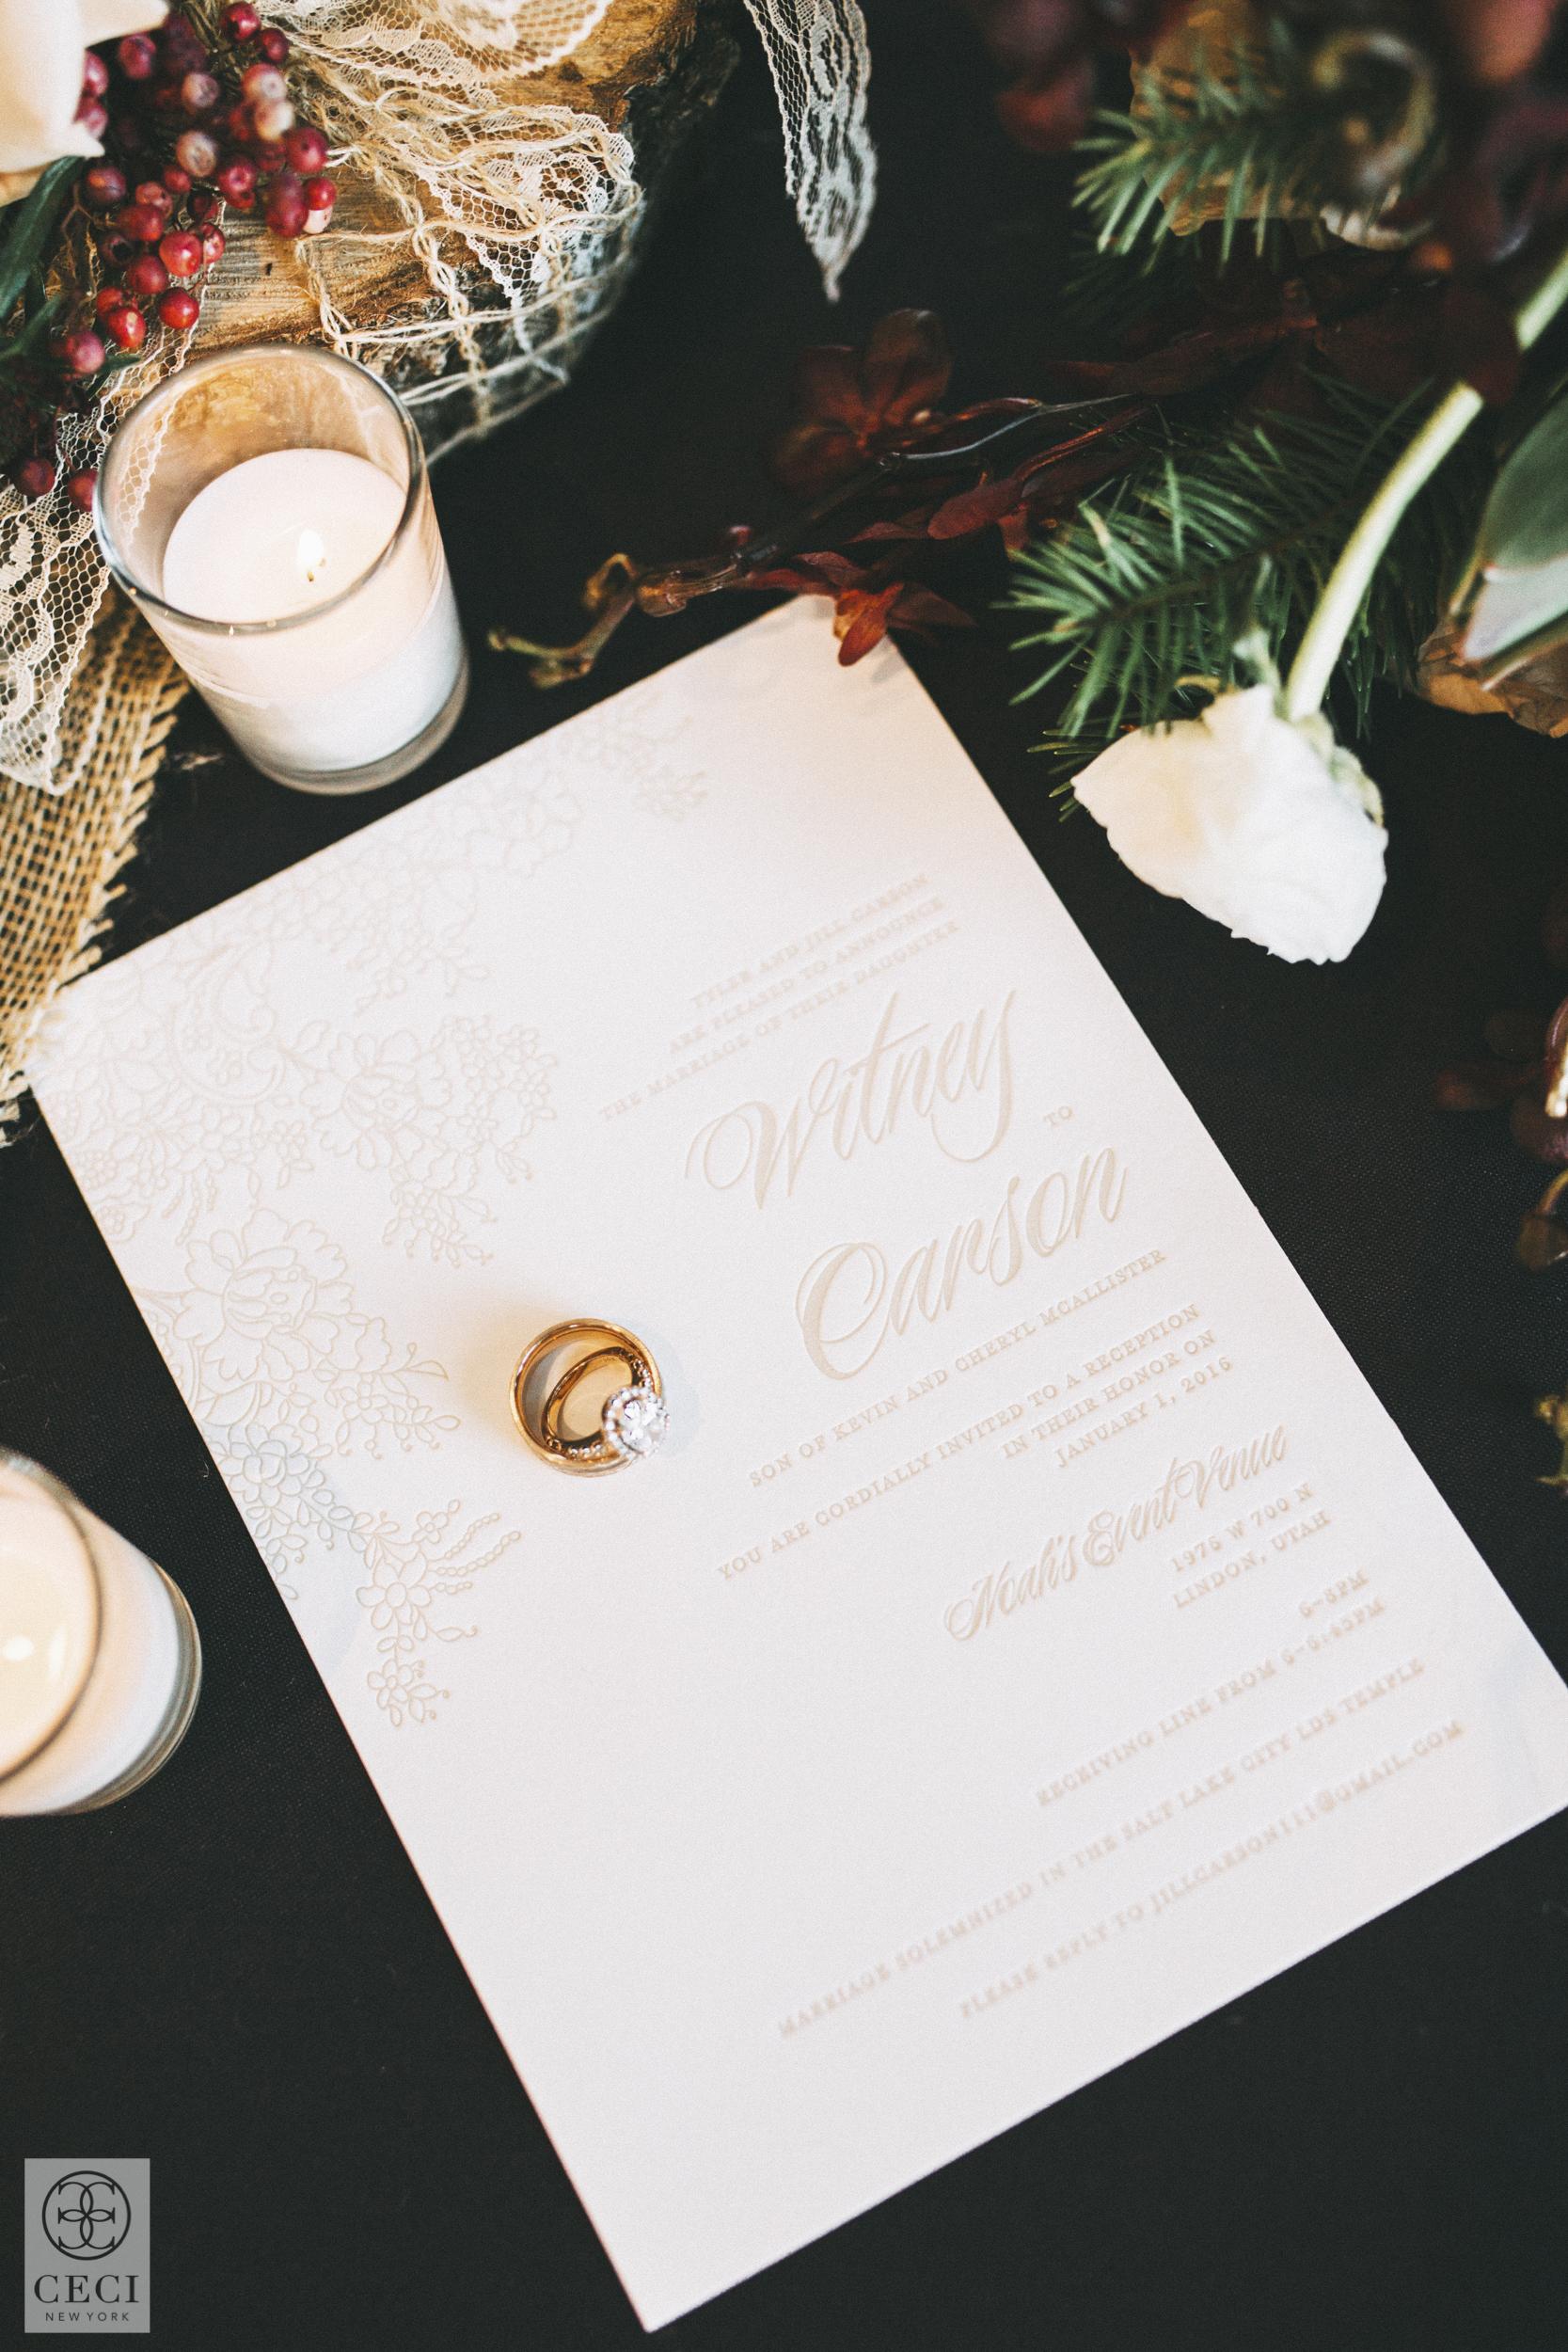 ceci_new_york_wedding_invitation_design_black_red_dramatic_macabre_statement-5.jpg